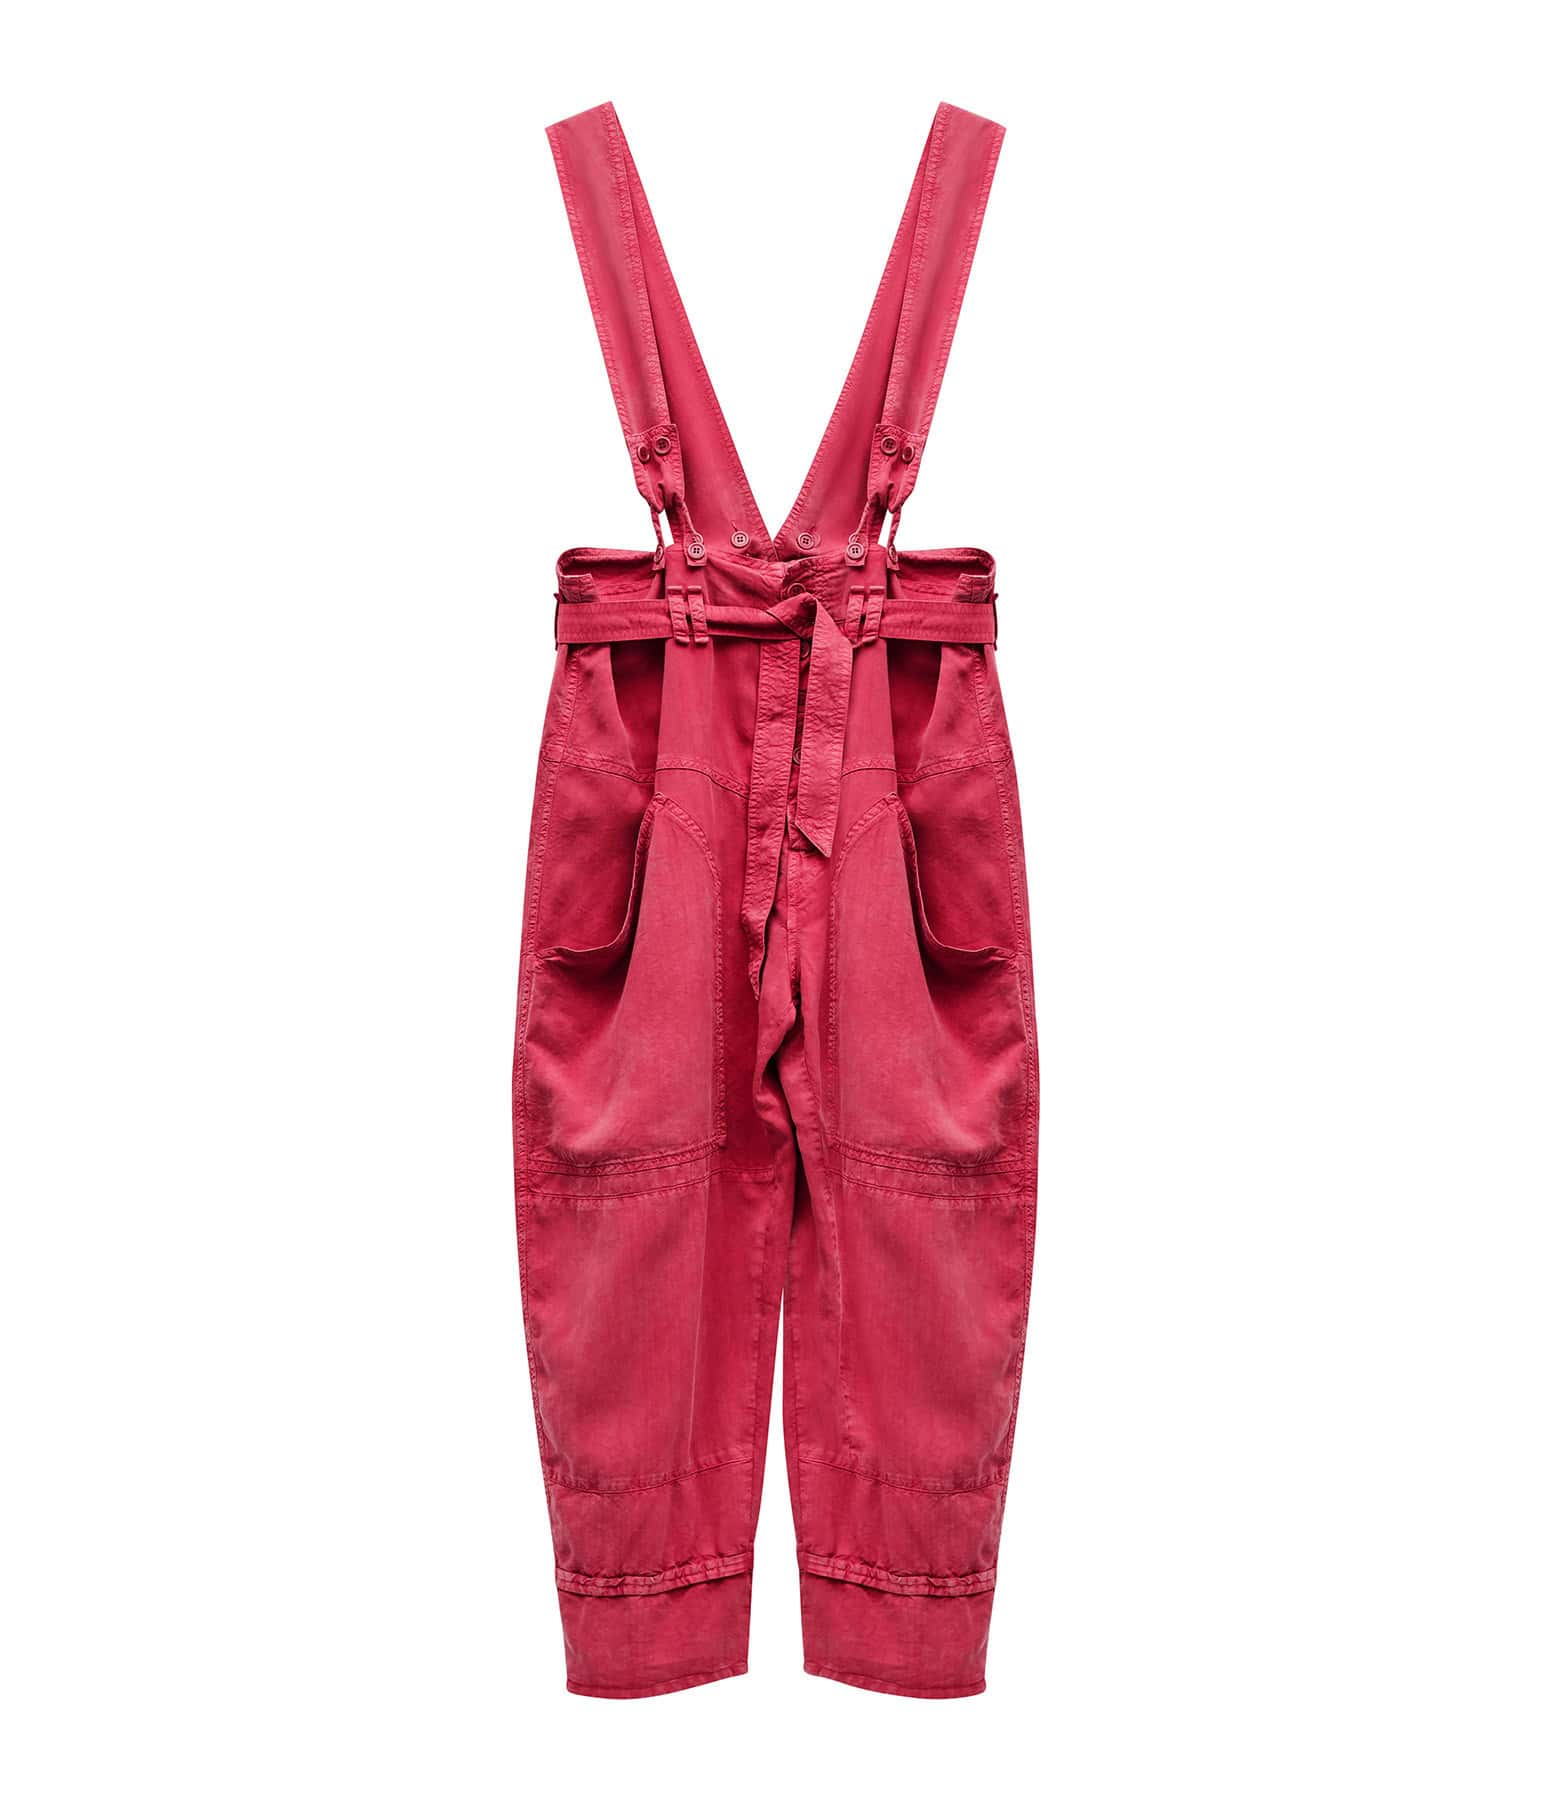 ISABEL MARANT - Pantalon Fineba Framboise